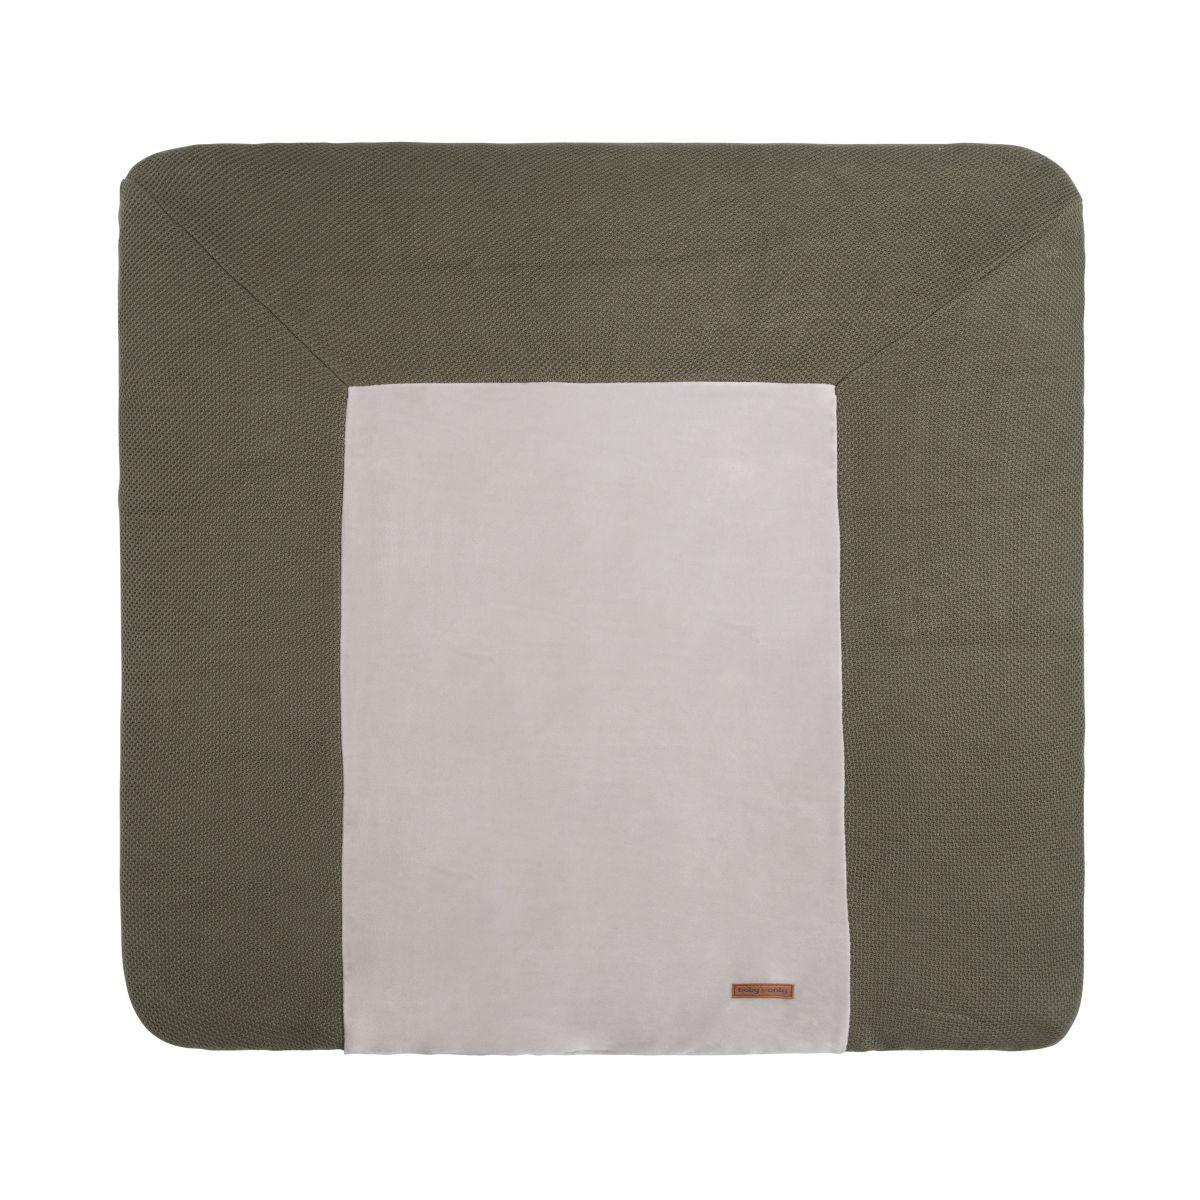 changing pad cover classic khaki 75x85